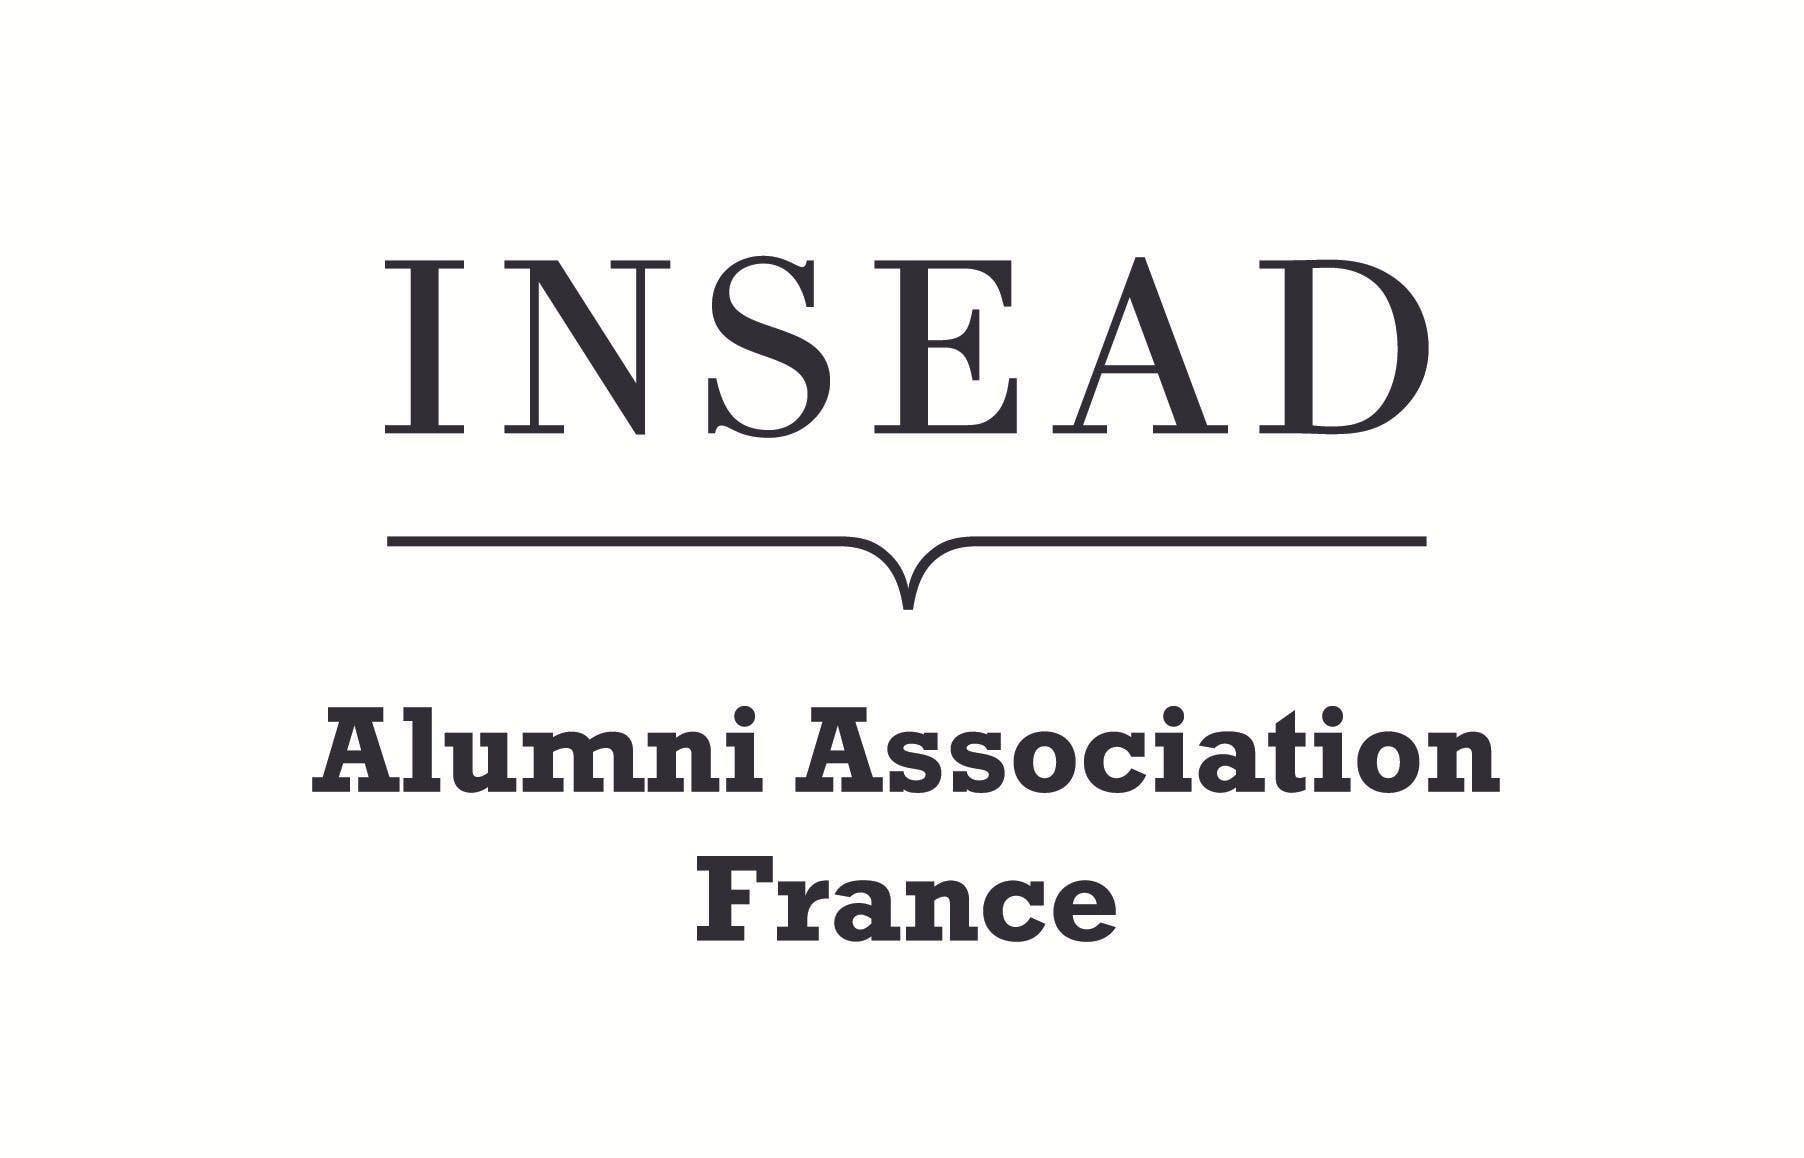 NEW CLUB Entrepreneurship - INSEAD Founder Fi